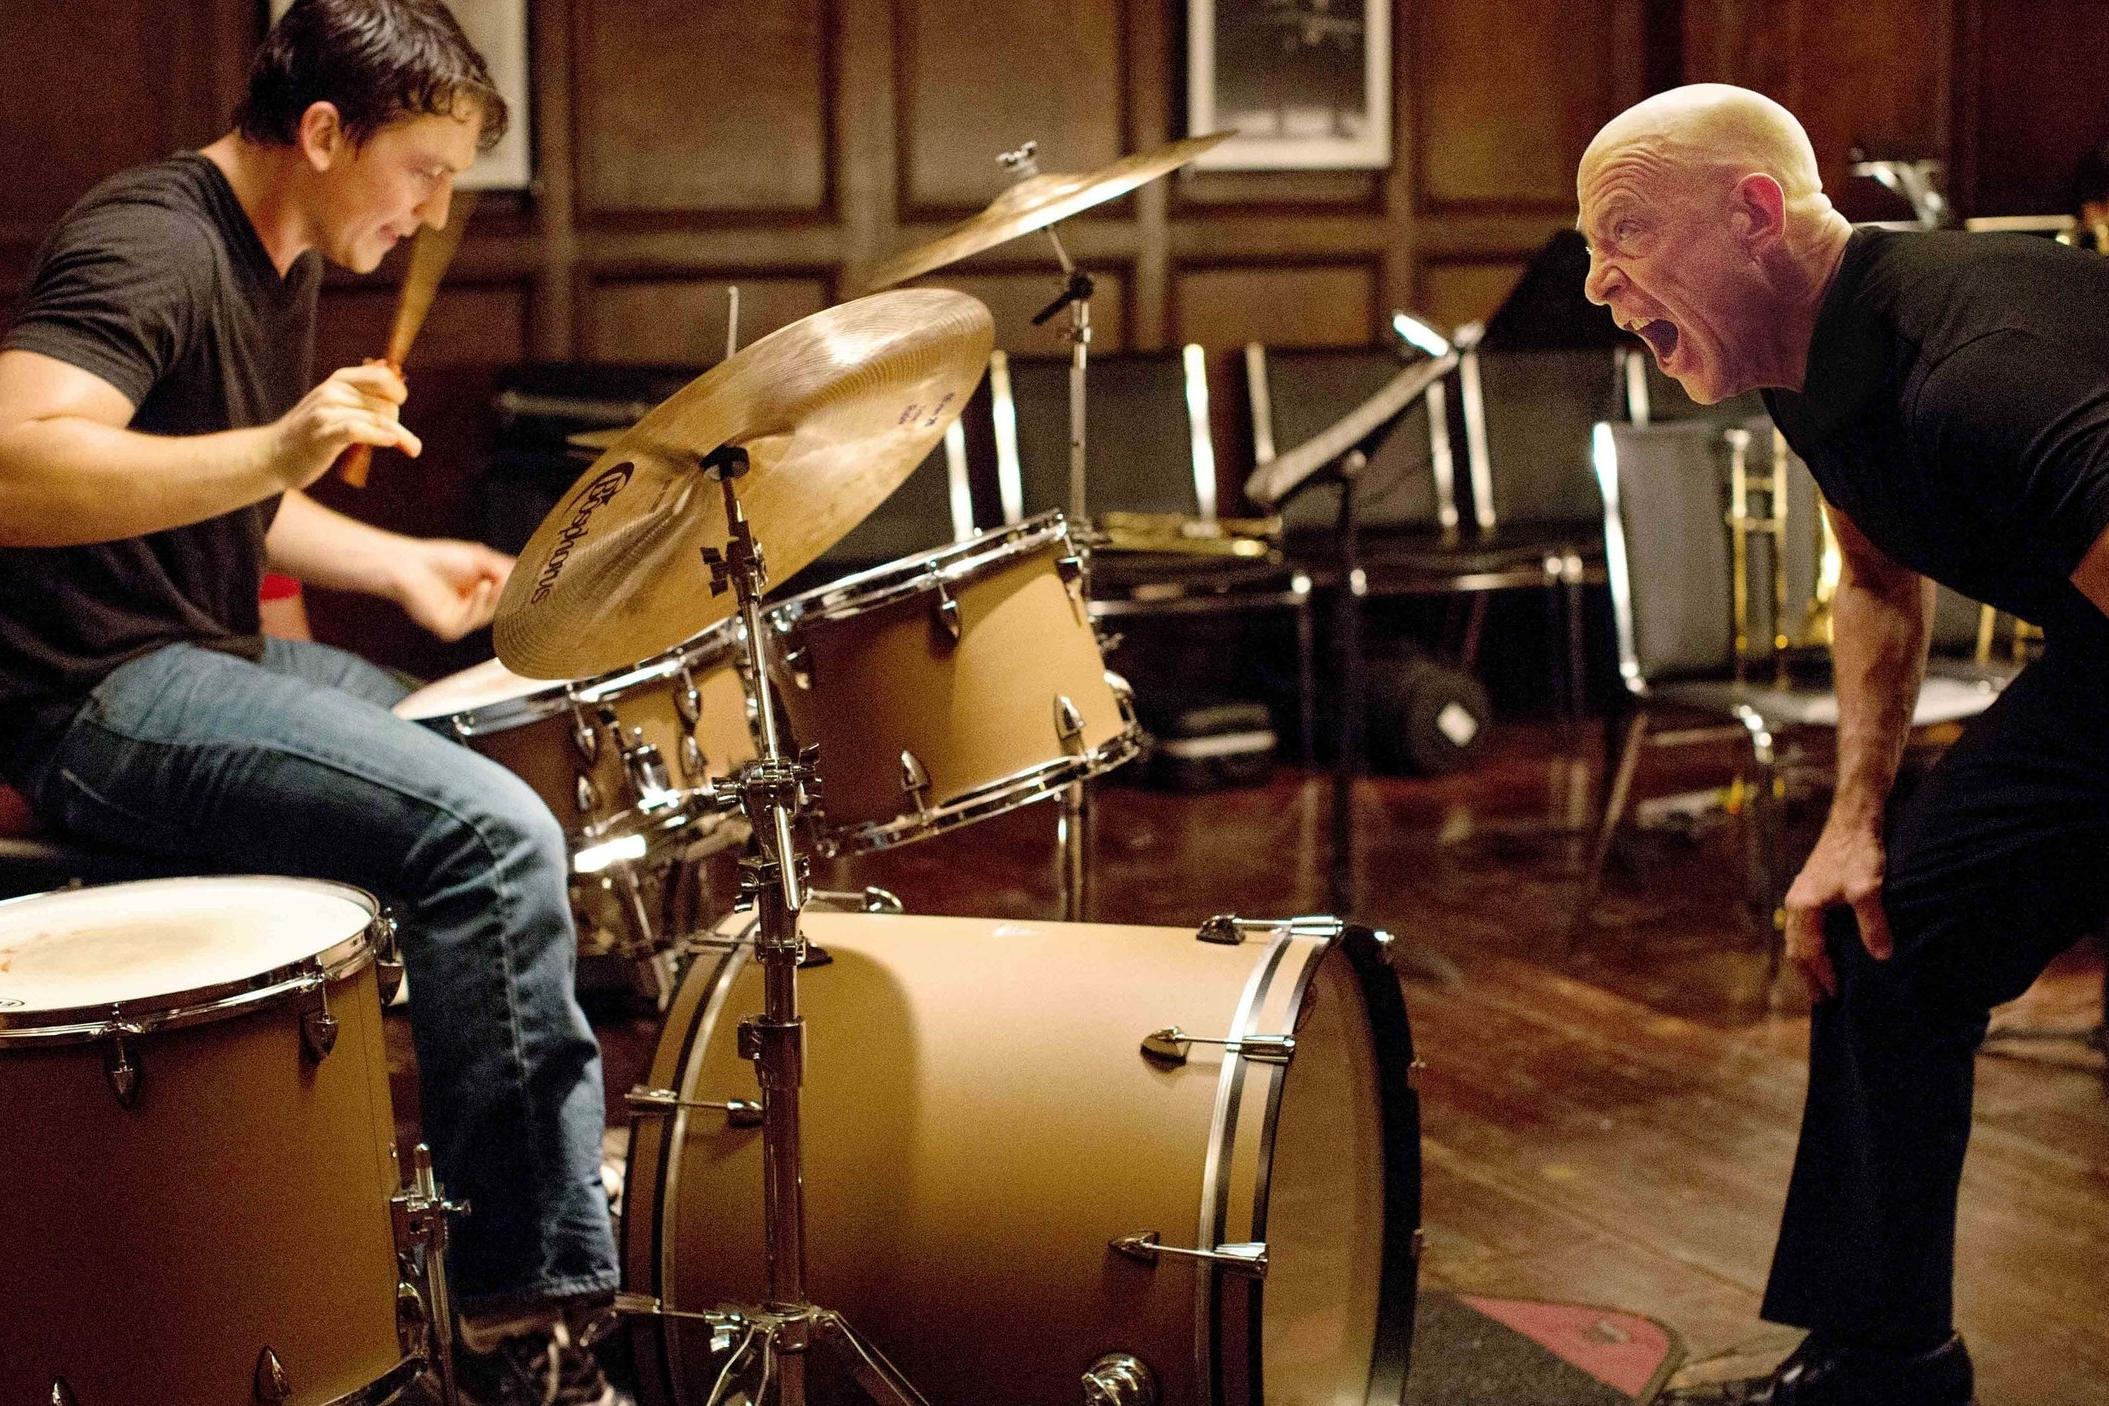 Whiplash (2014) - Directed by: Damien ChazelleWritten by: Damien Chazelle